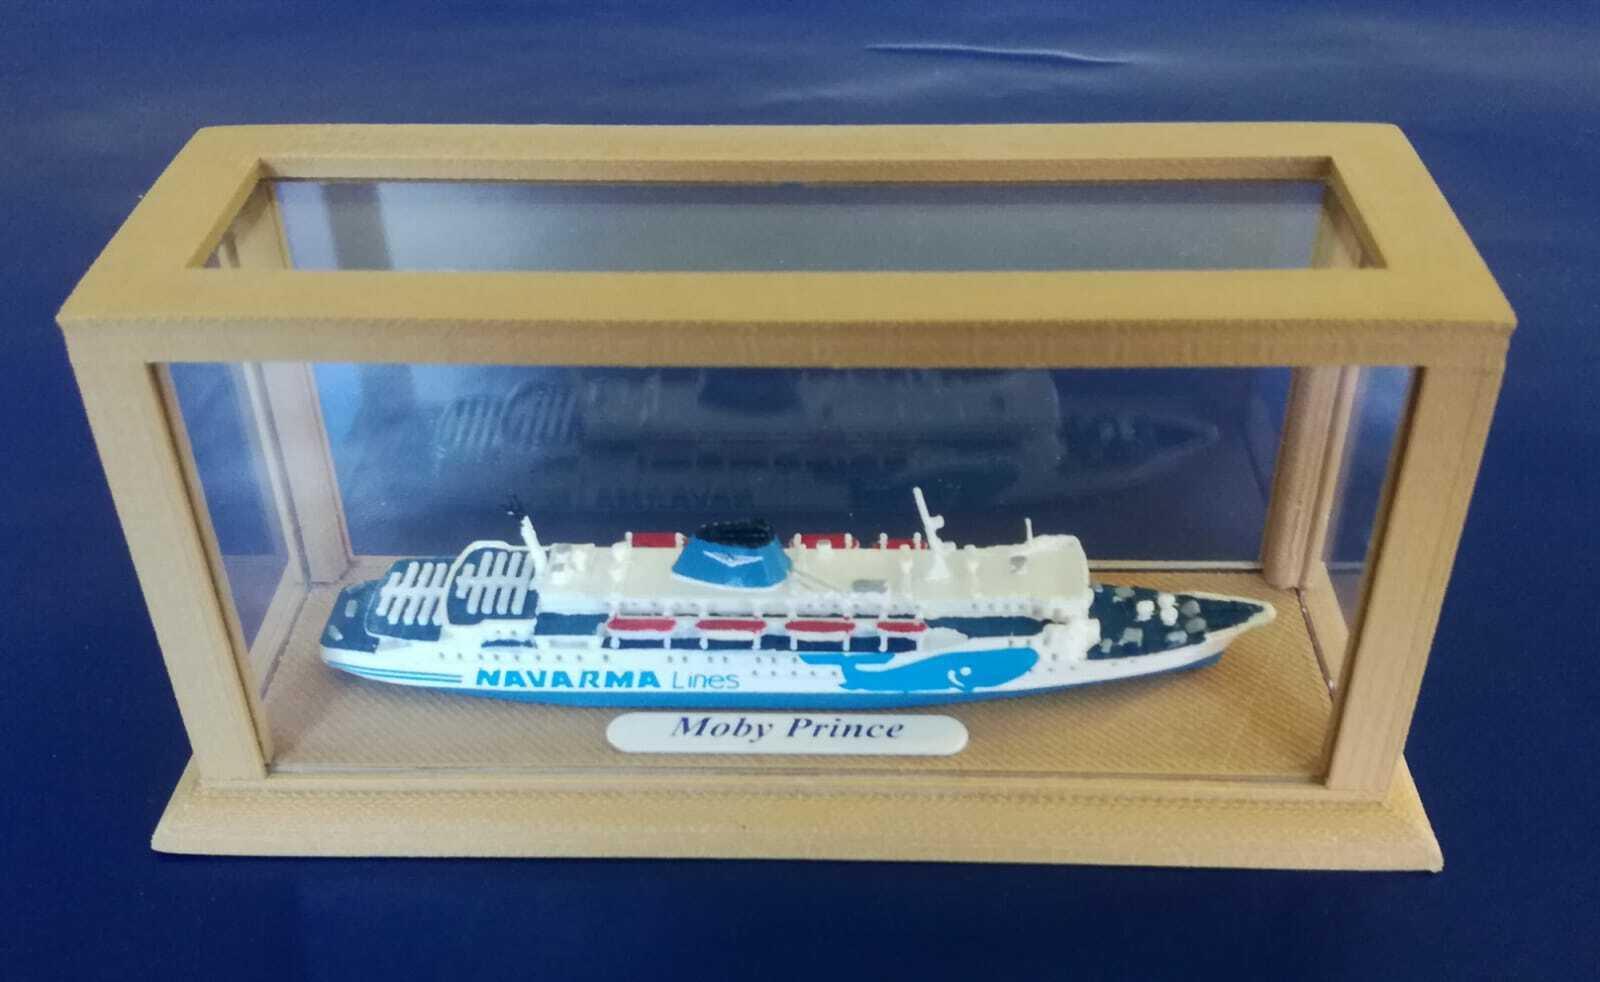 MOBY PRINCE ex Koningin Juliana modellino nave scala 1 1000 MOBY- Navarma Lines